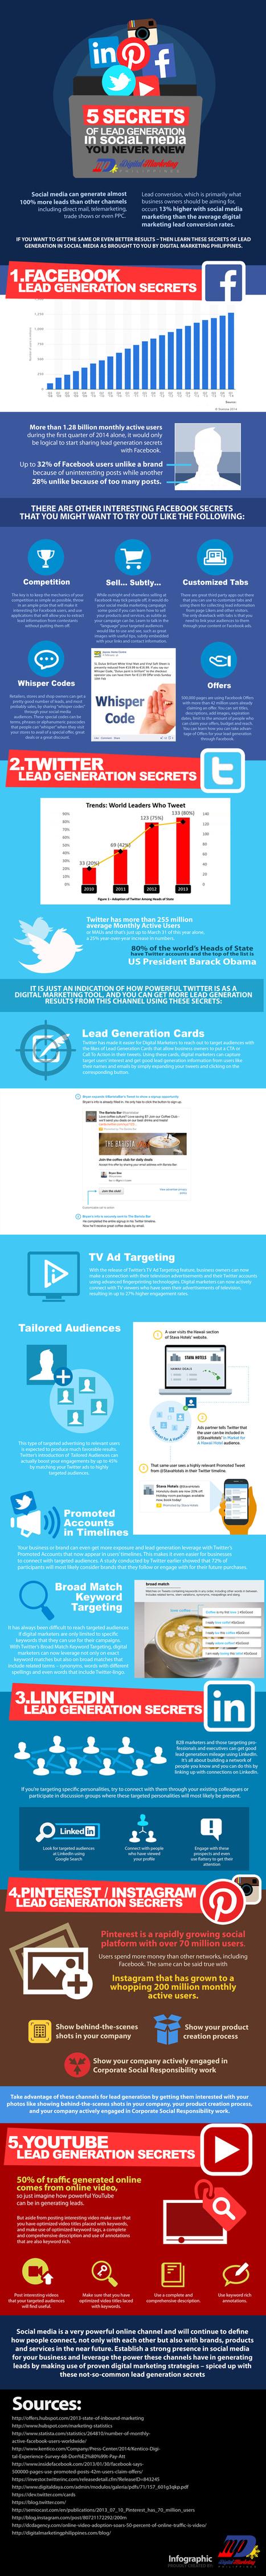 5 Secrets of Lead Generation in Social Media You Never Knew | Web Design, SEO & Social Media Marketing | Scoop.it